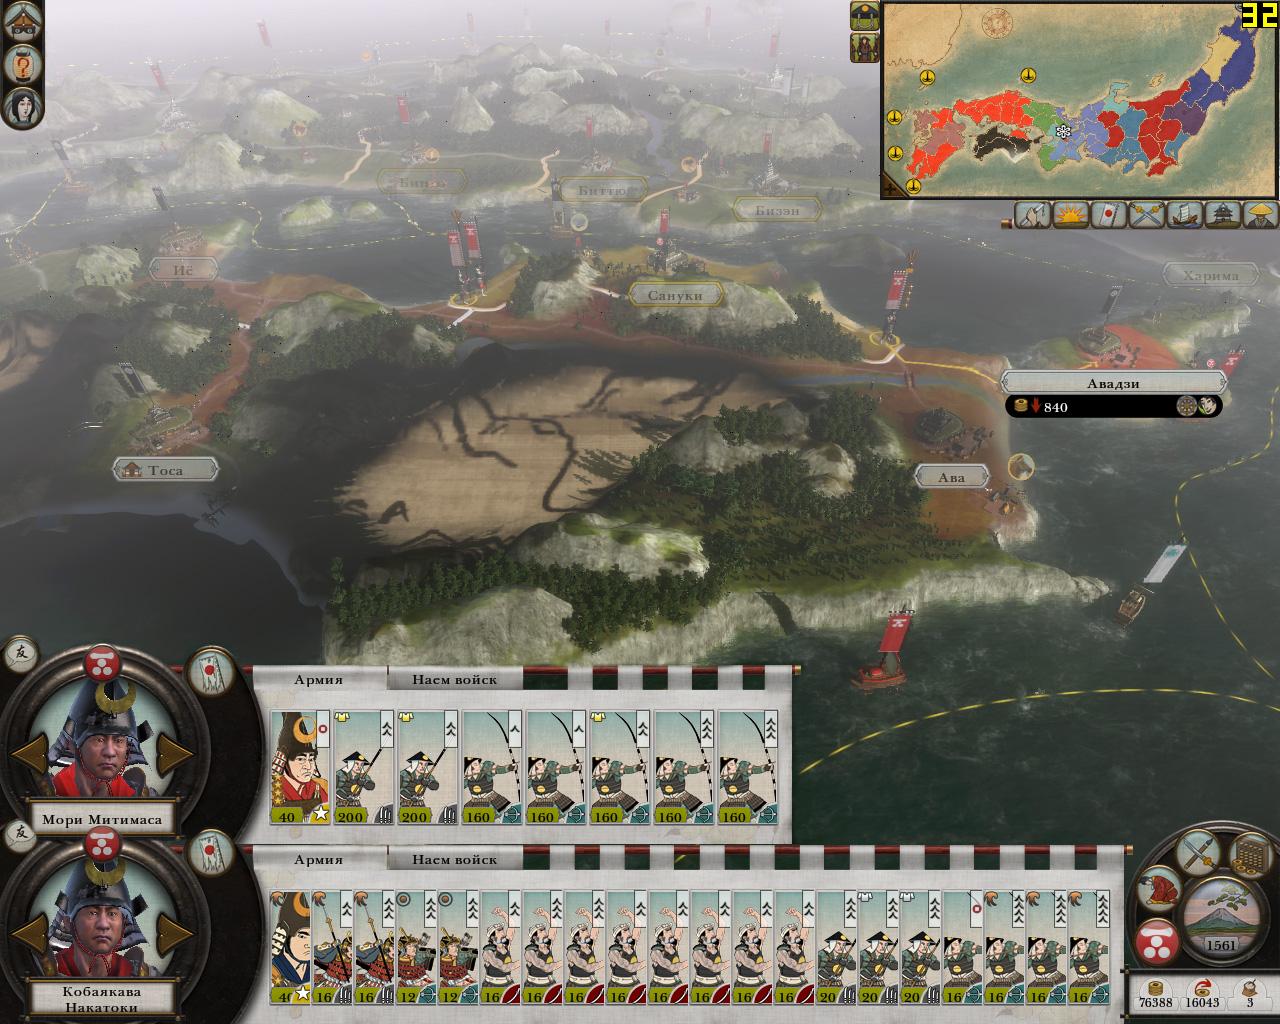 Shogun 2 Total war patch 23 24 Patch